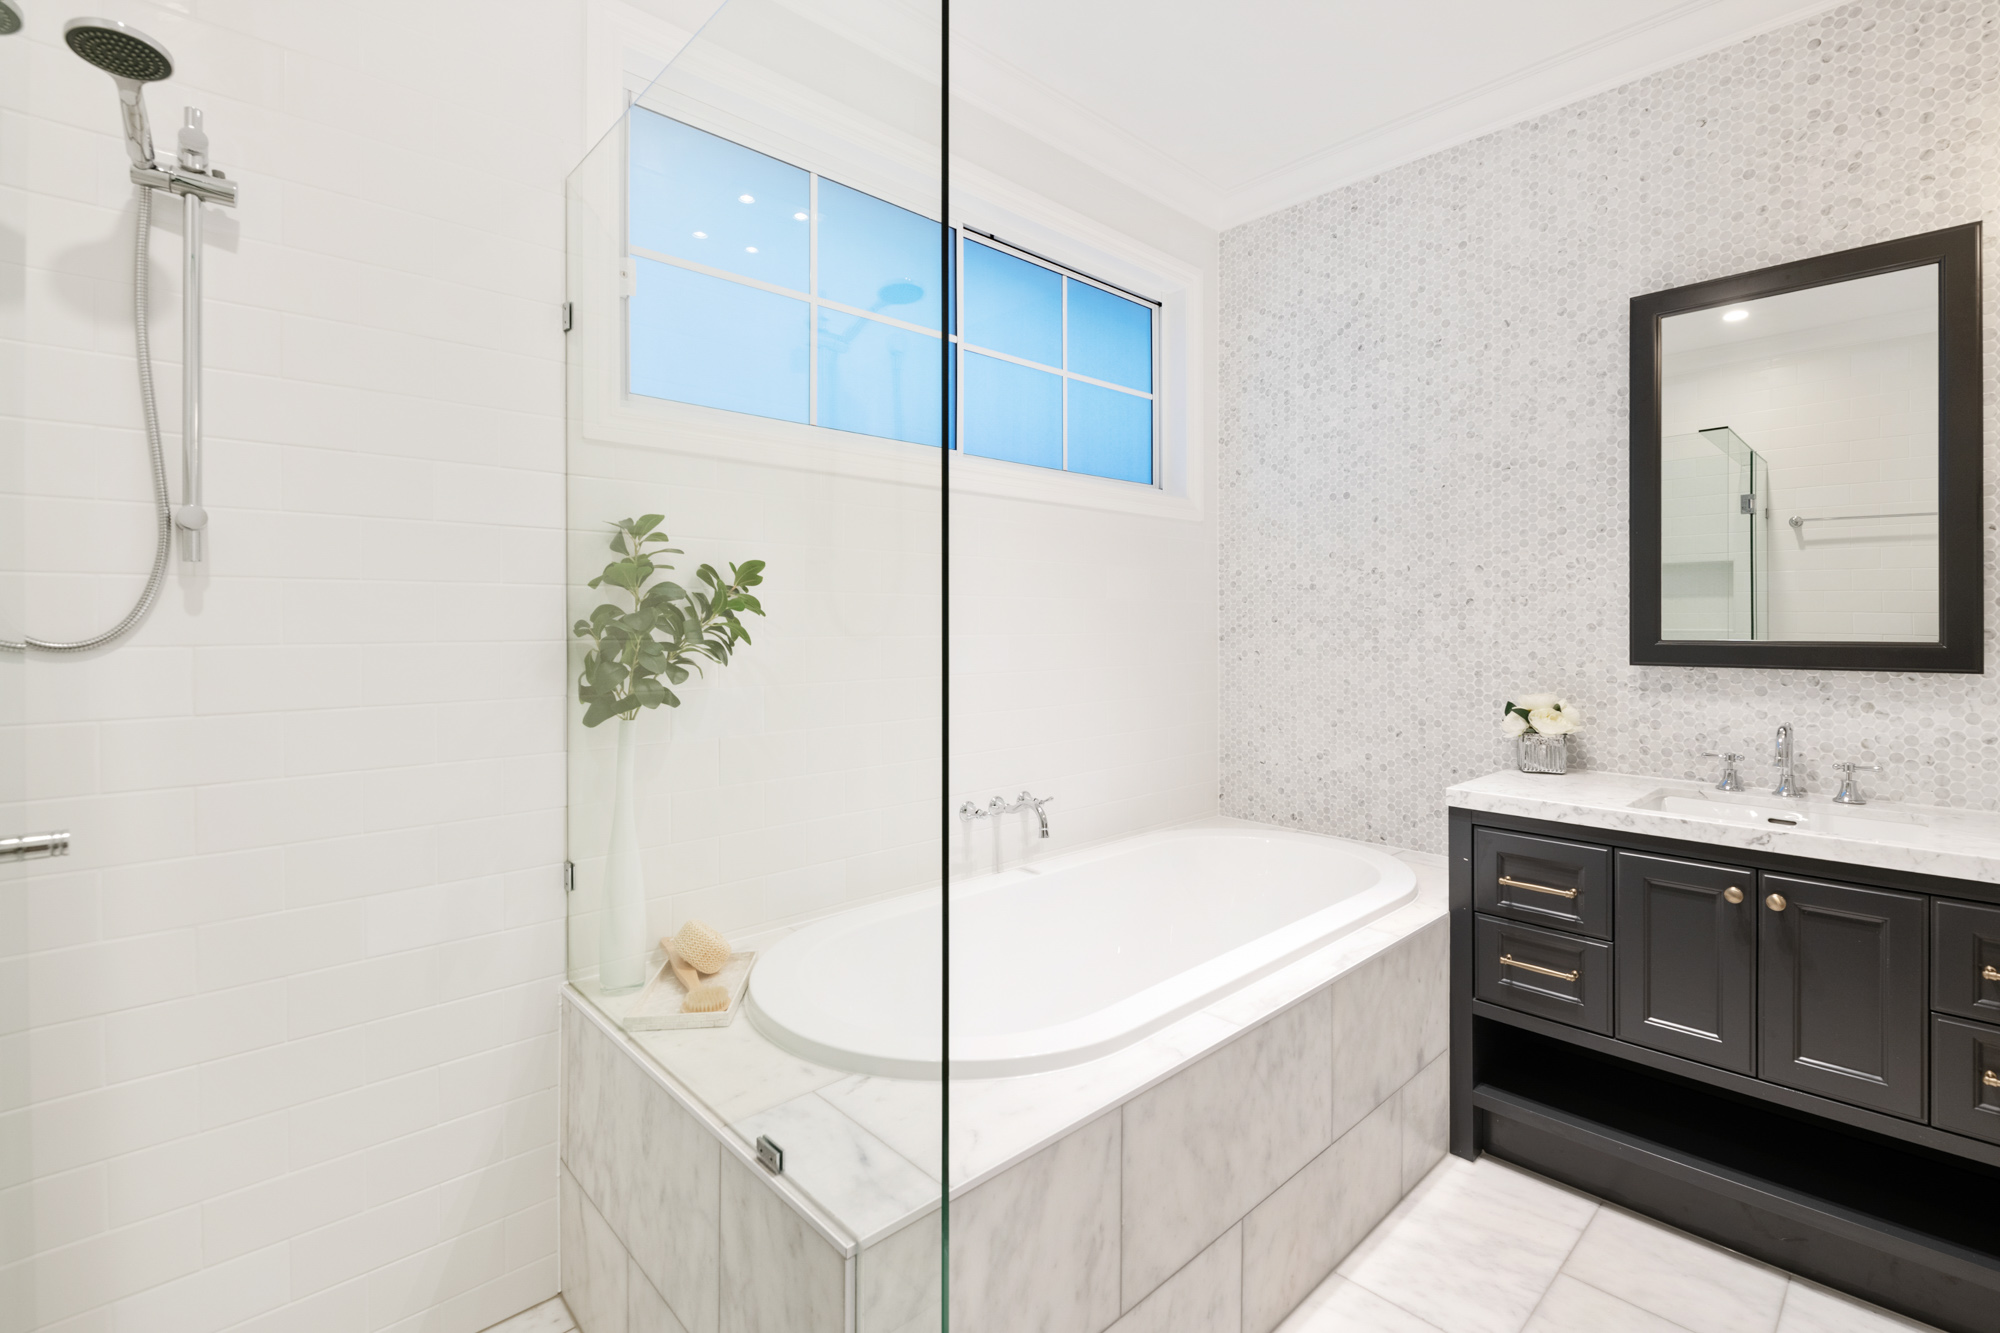 Germancraft Cabinets Sample Bathroom